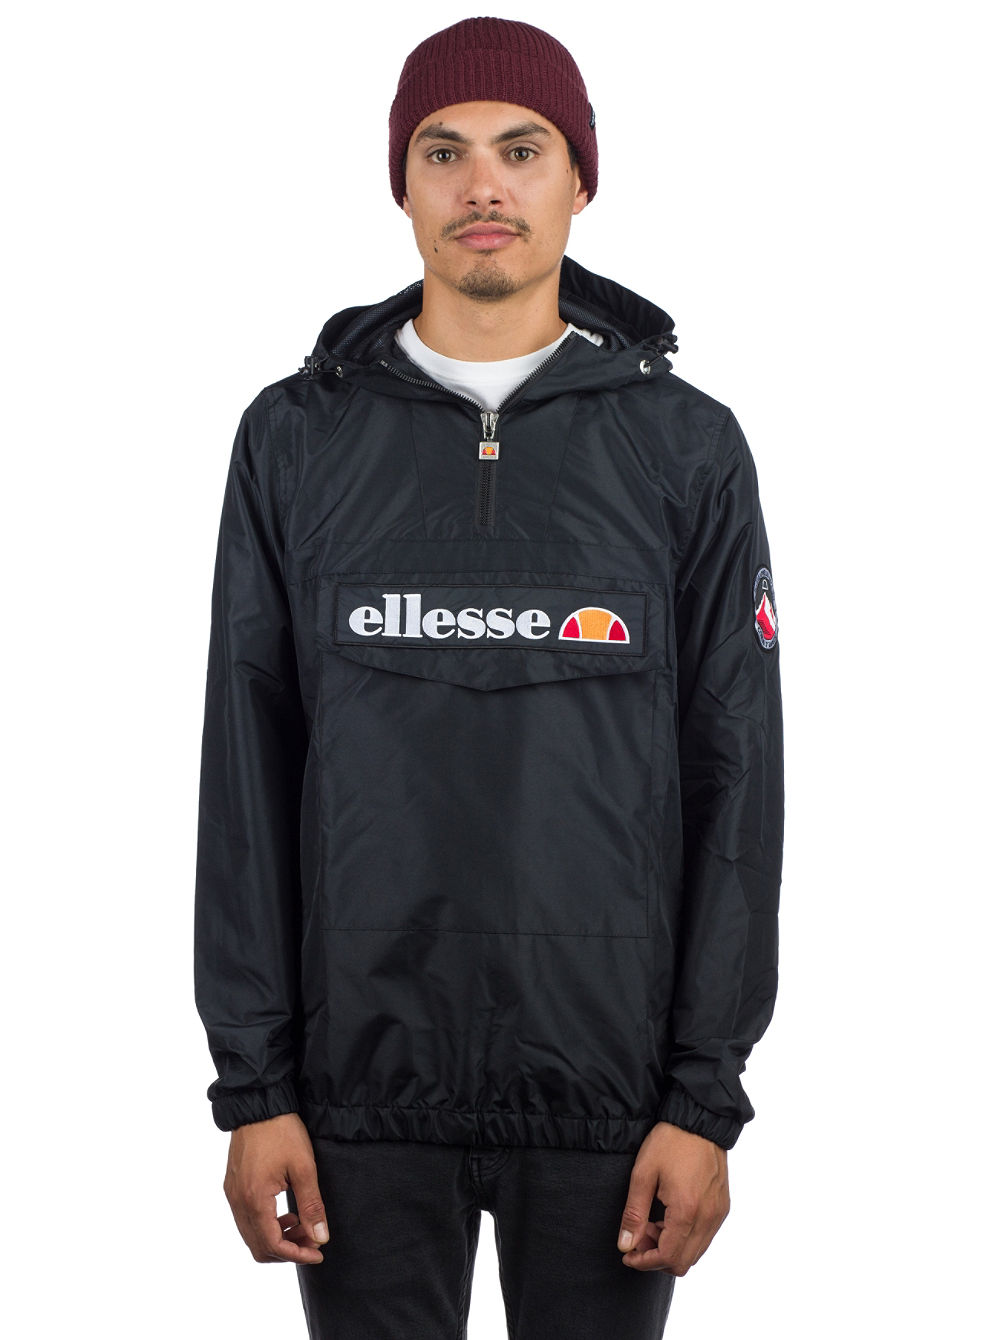 Kup Ellesse Mont 2 Oh Jacket online na blue-tomato.com c8c2e964d2